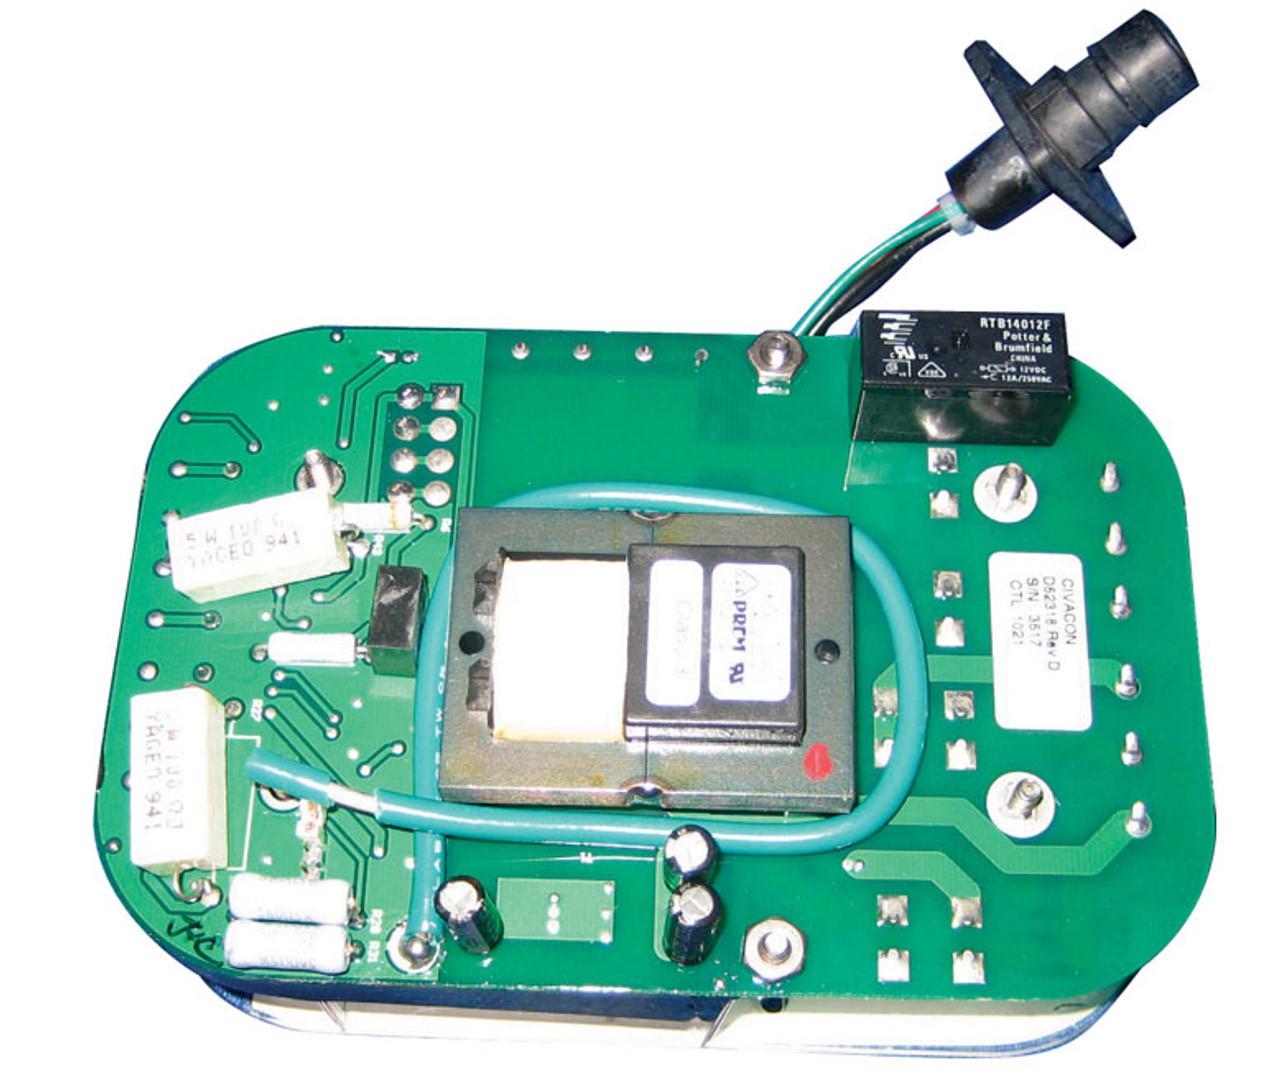 Civacon Printed Circuit Board (PCB) Replacement Parts